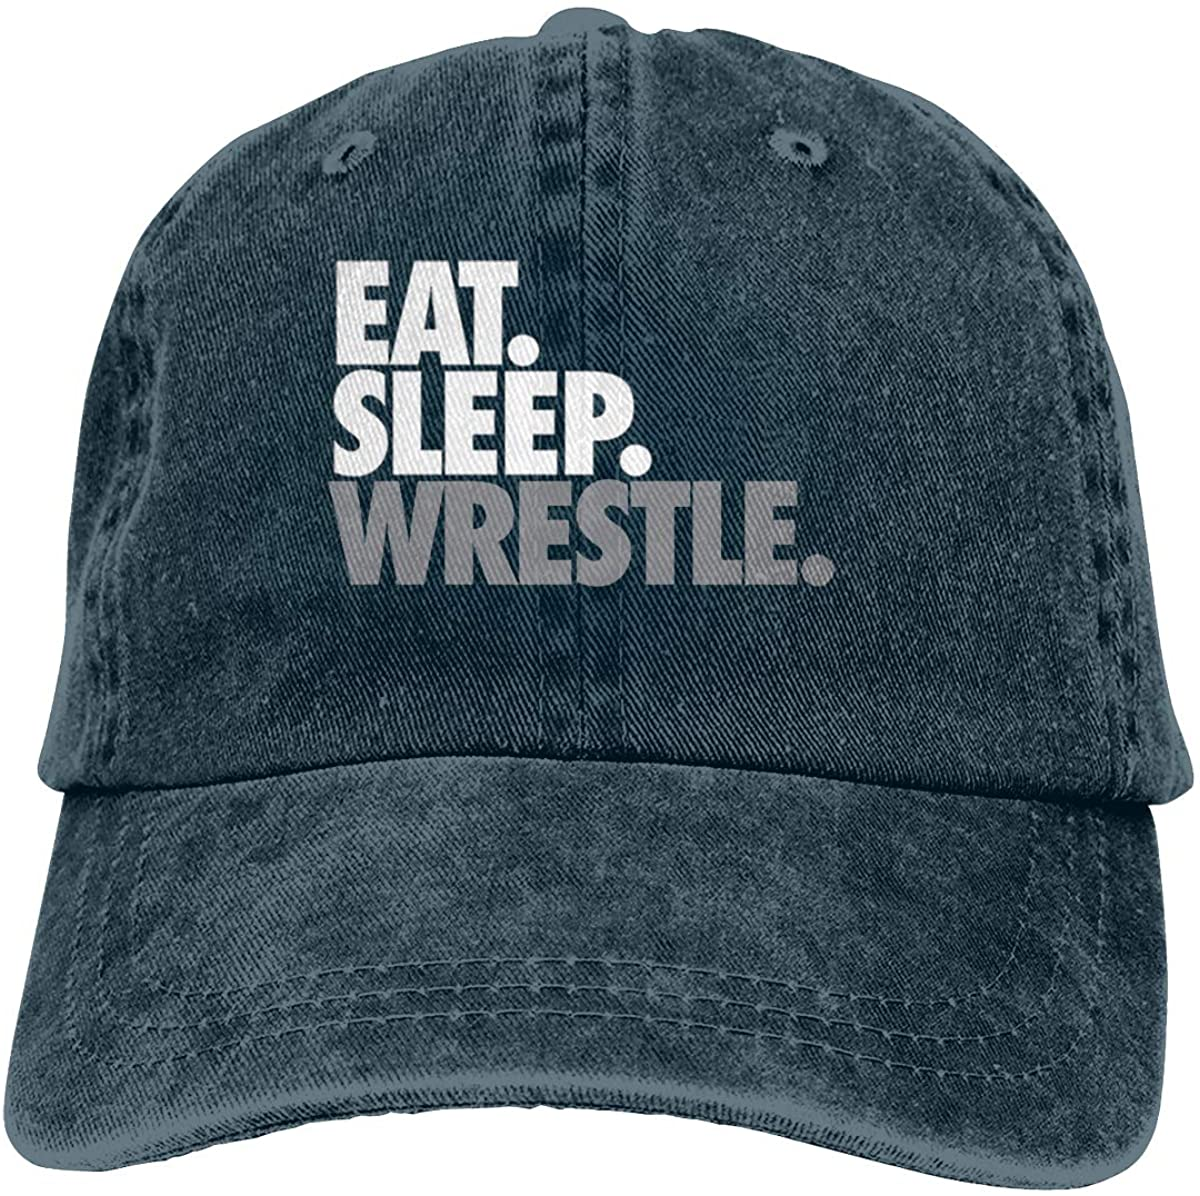 Eat Sleep Wrestle Youth Unisex Soft Casquette Cap Vintage Adjustable Baseball Caps